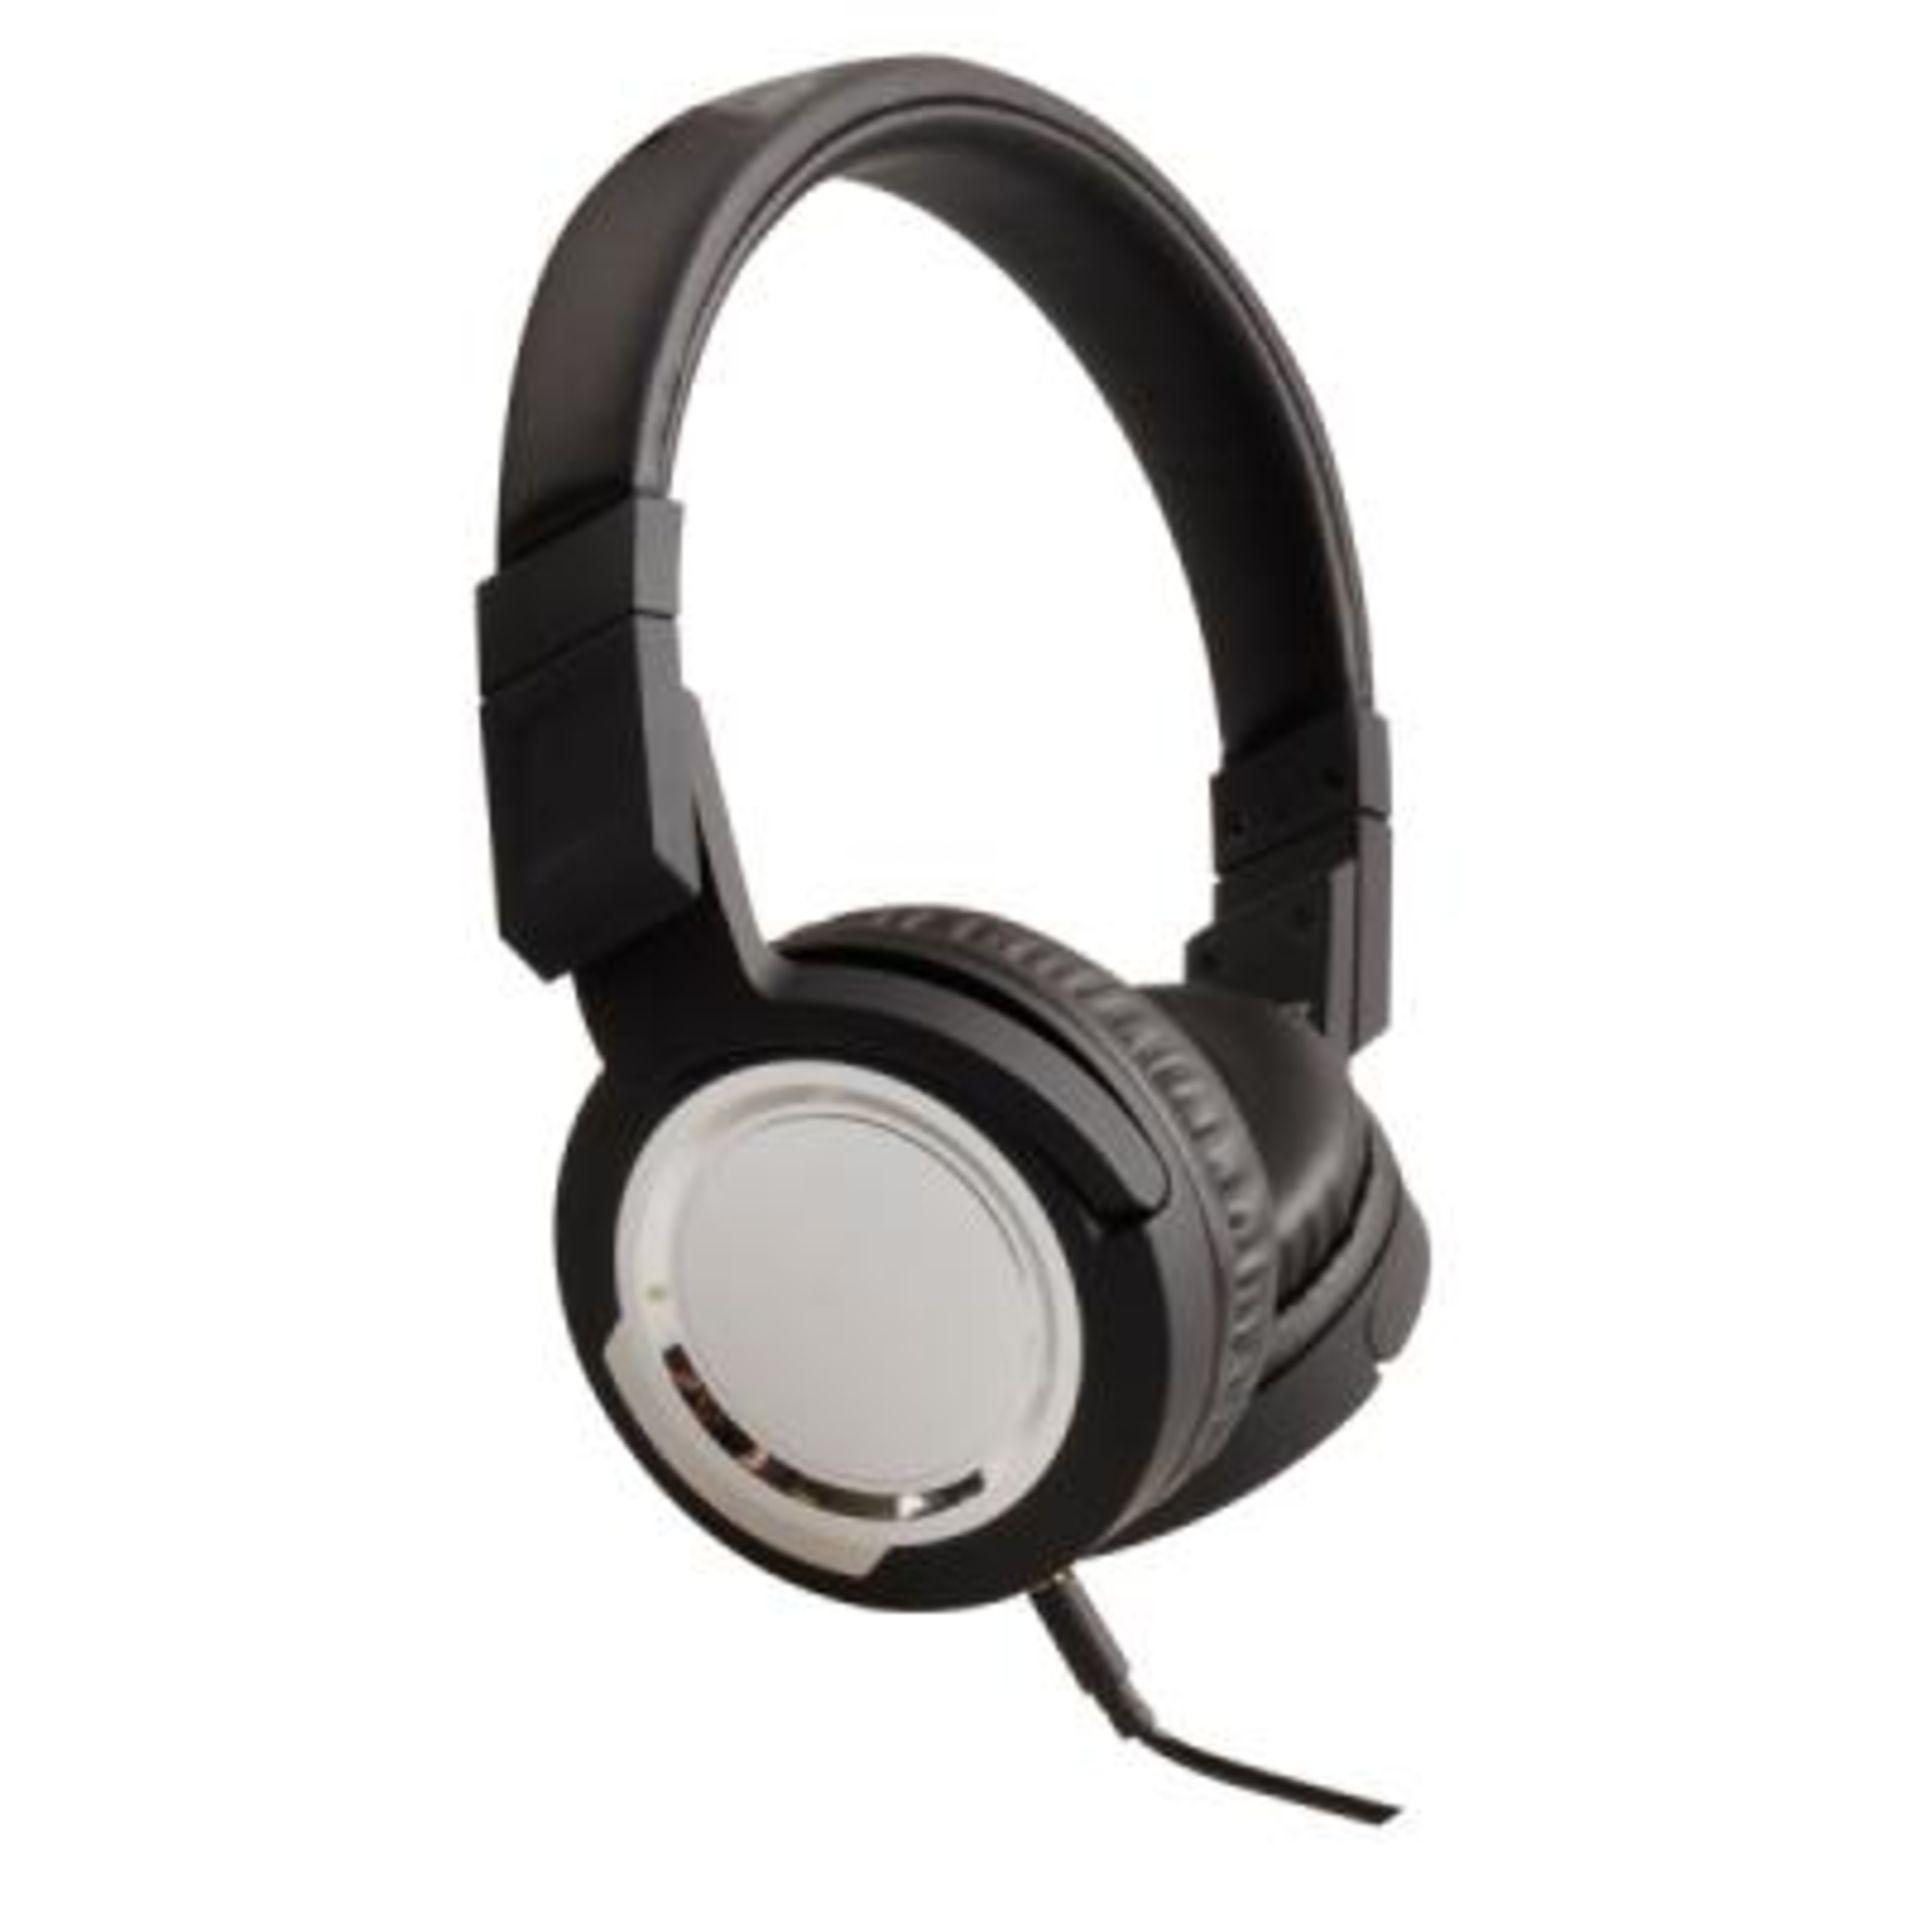 + VAT Brand New On-Earz DJ Headset - High Definition - Crazy Bass & Crystal Clear Sound - Rotating